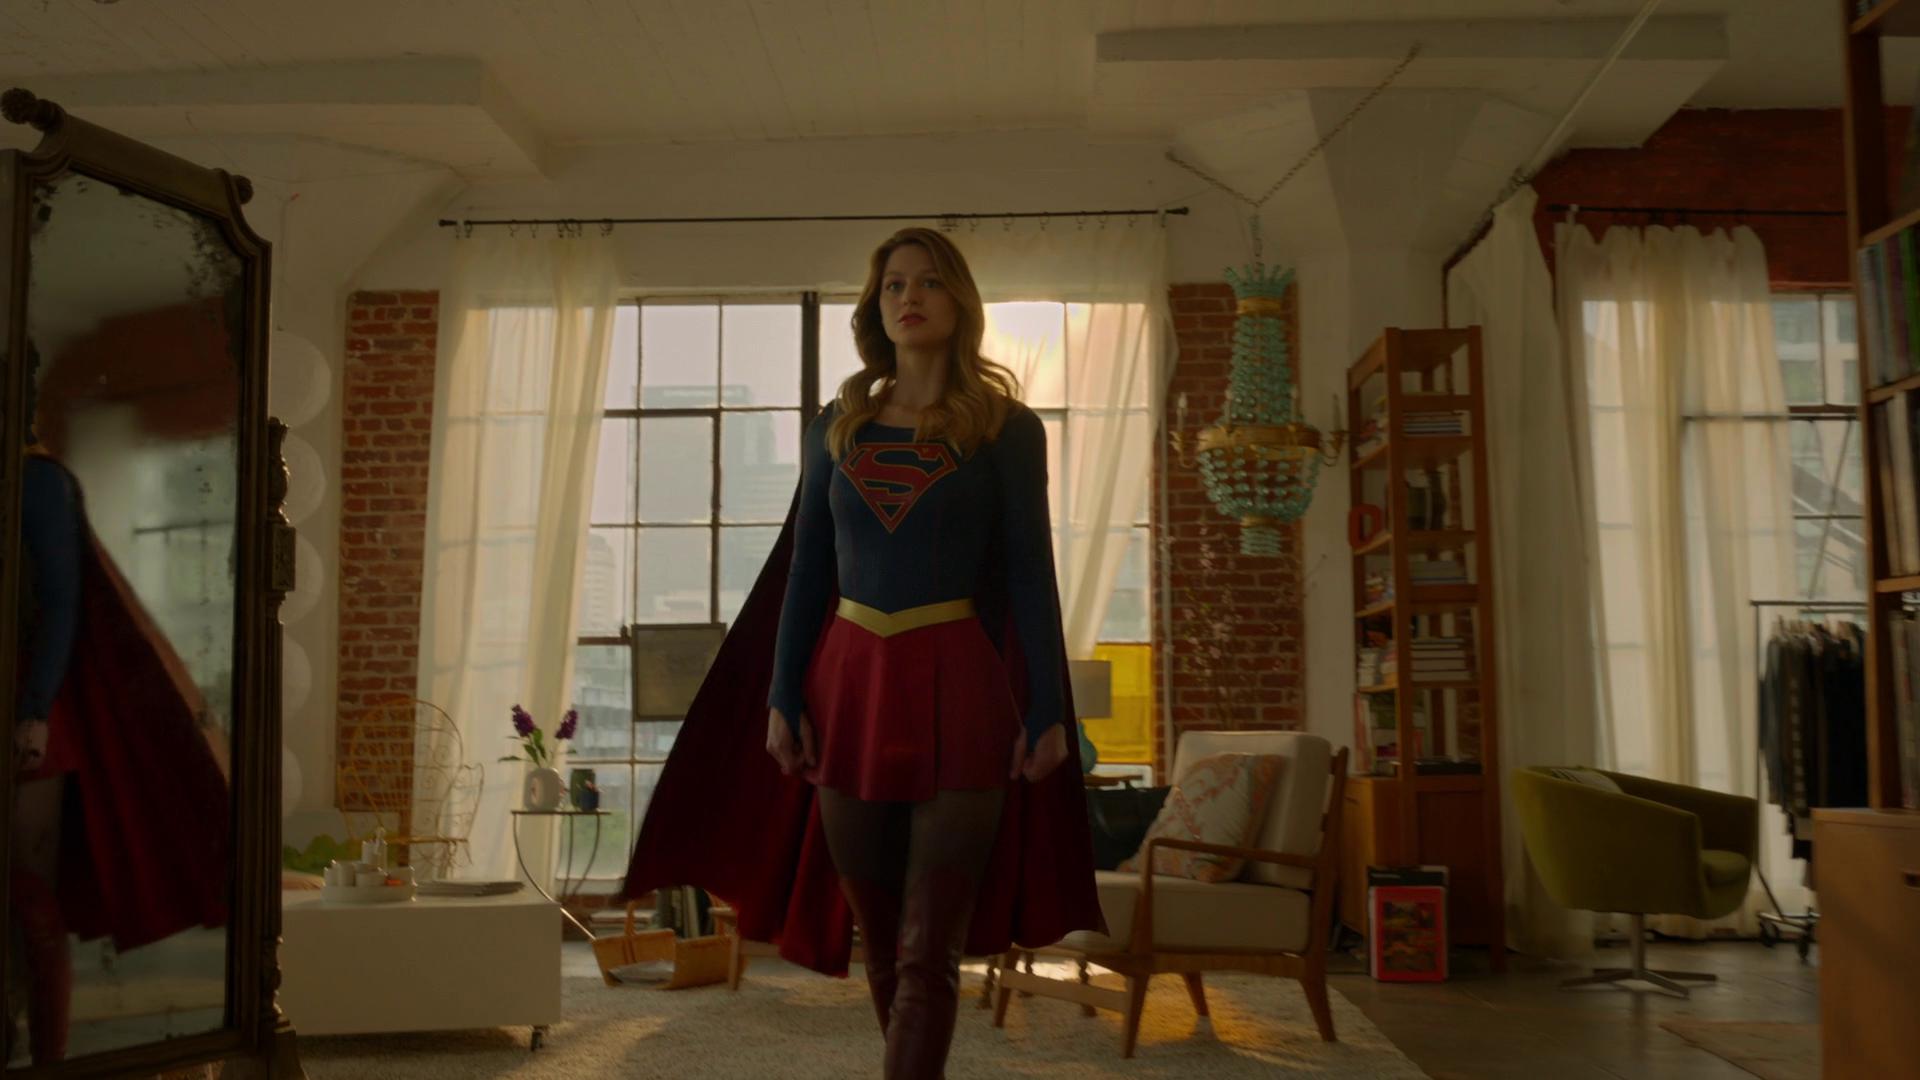 Archivo:Supergirl suit.png